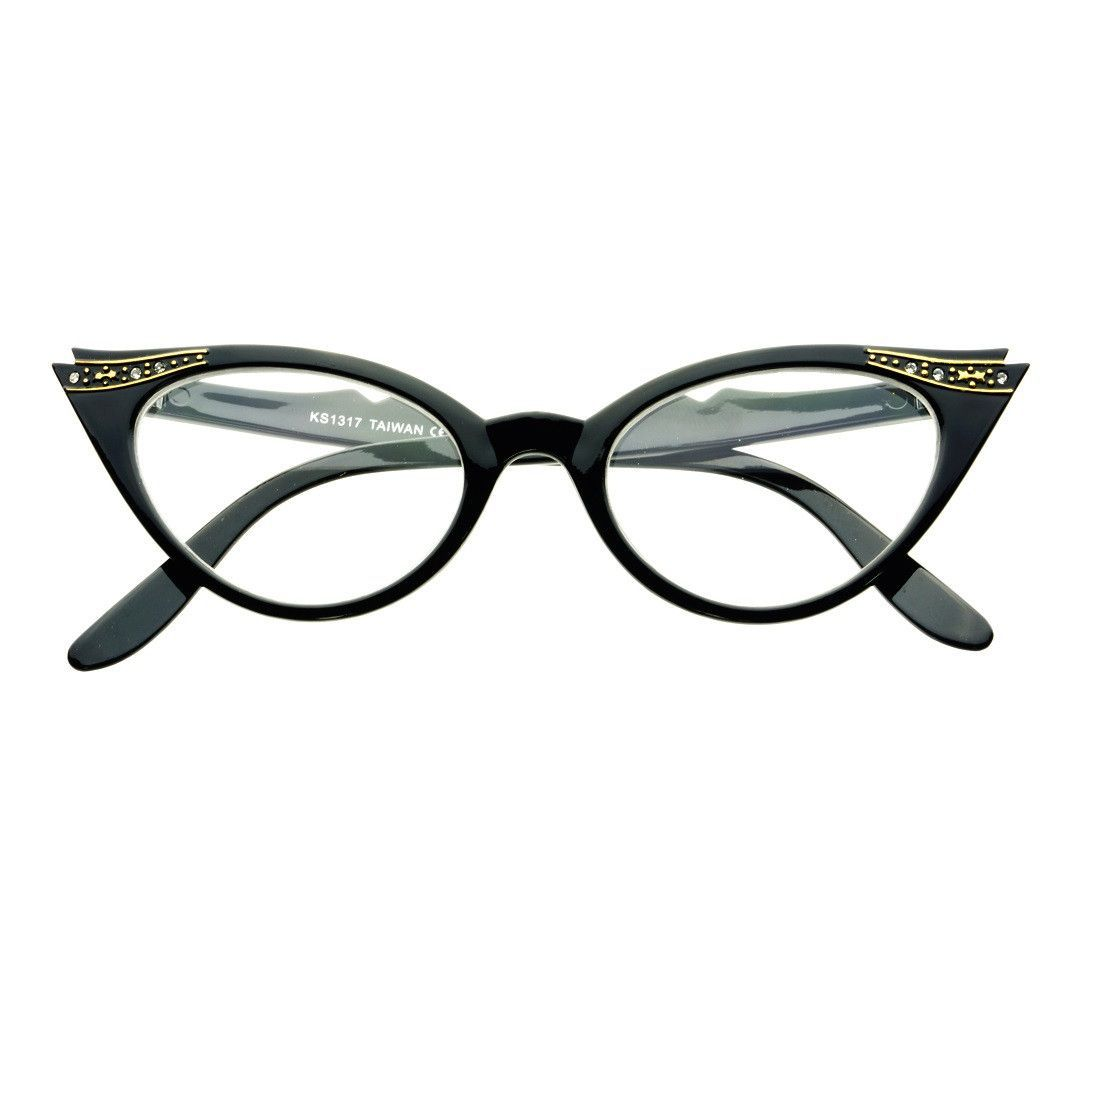 Womens Vintage Inspired Clear Lens Cat Eye Glasses Frames C68 | Fun ...